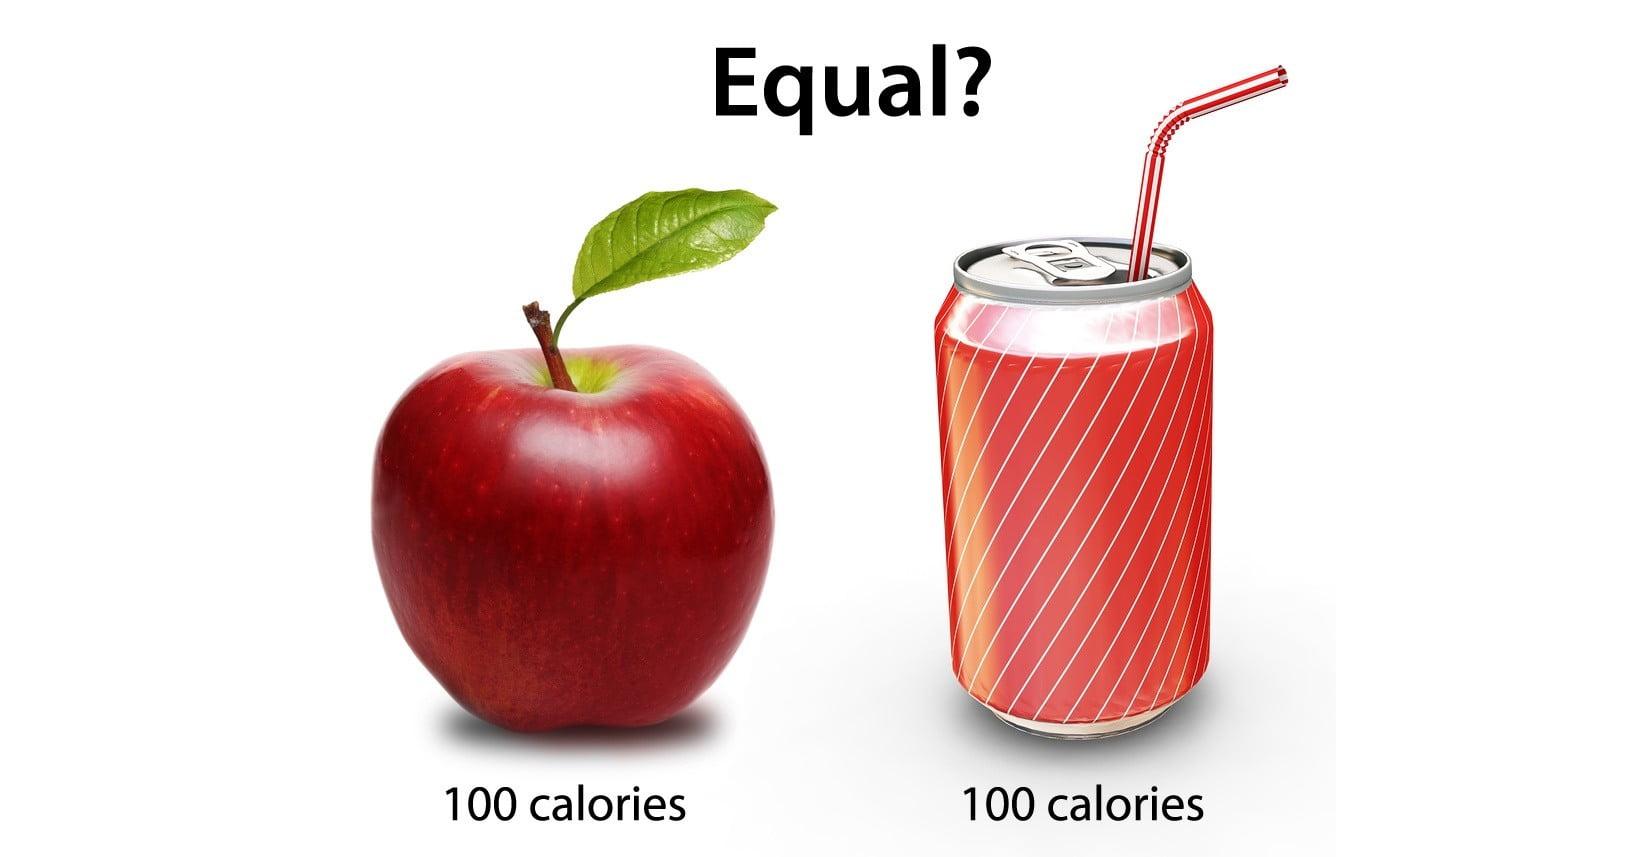 soda-apple-calories